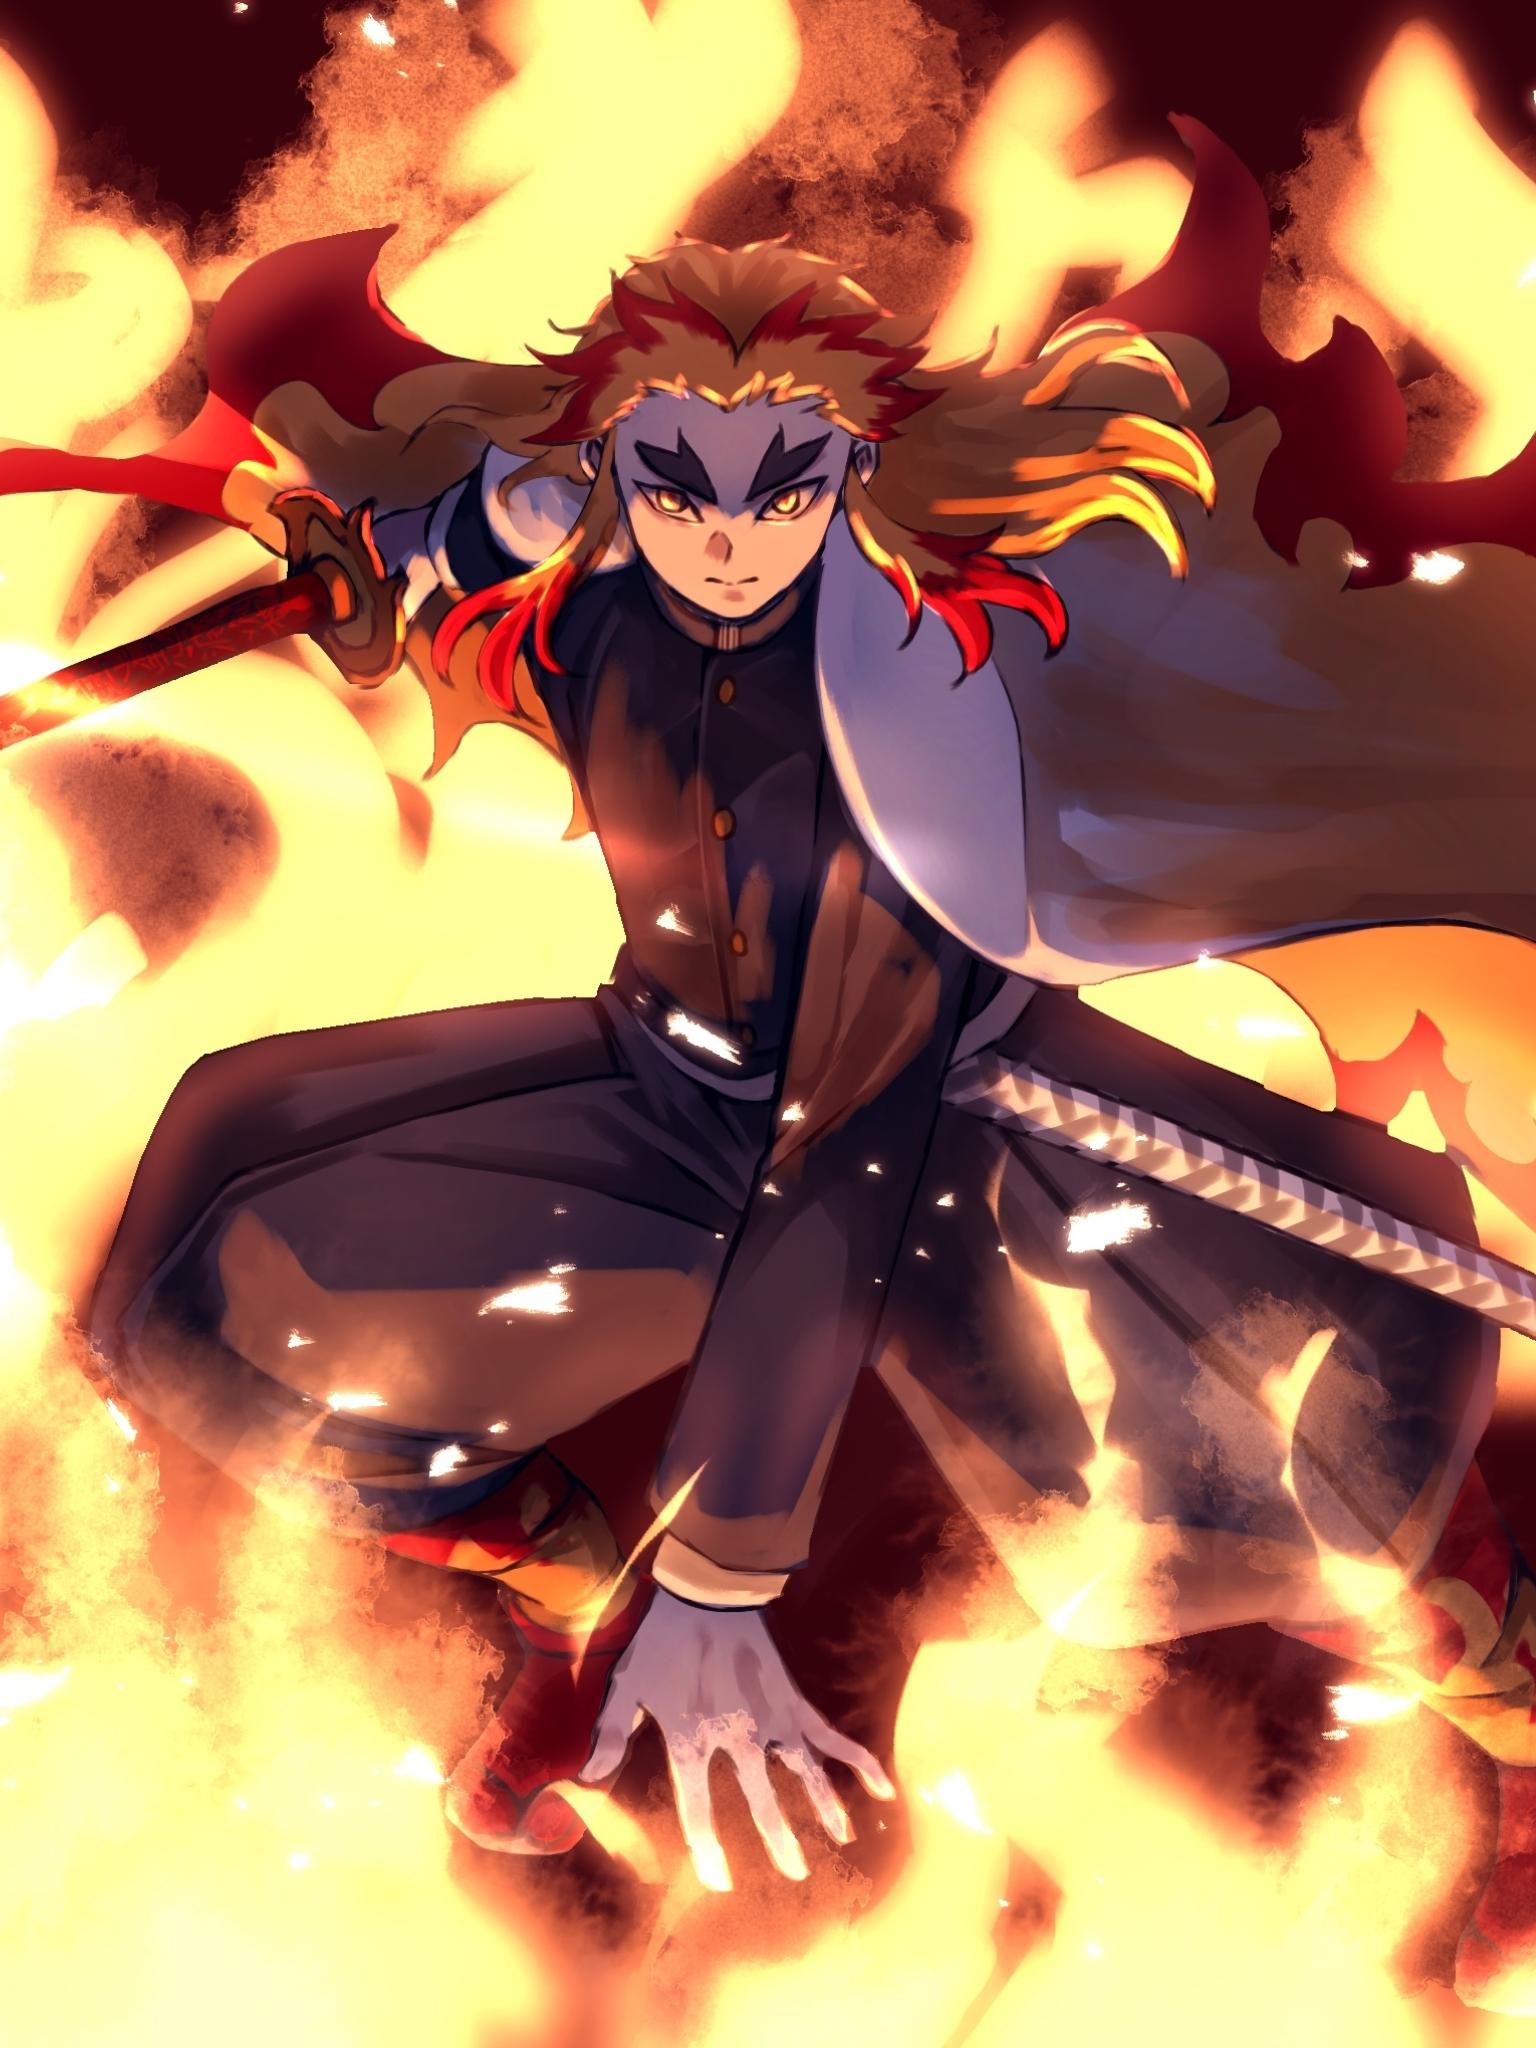 1536x2048 Kyojuro Rengoku From Demon Slayer 1536x2048 ...